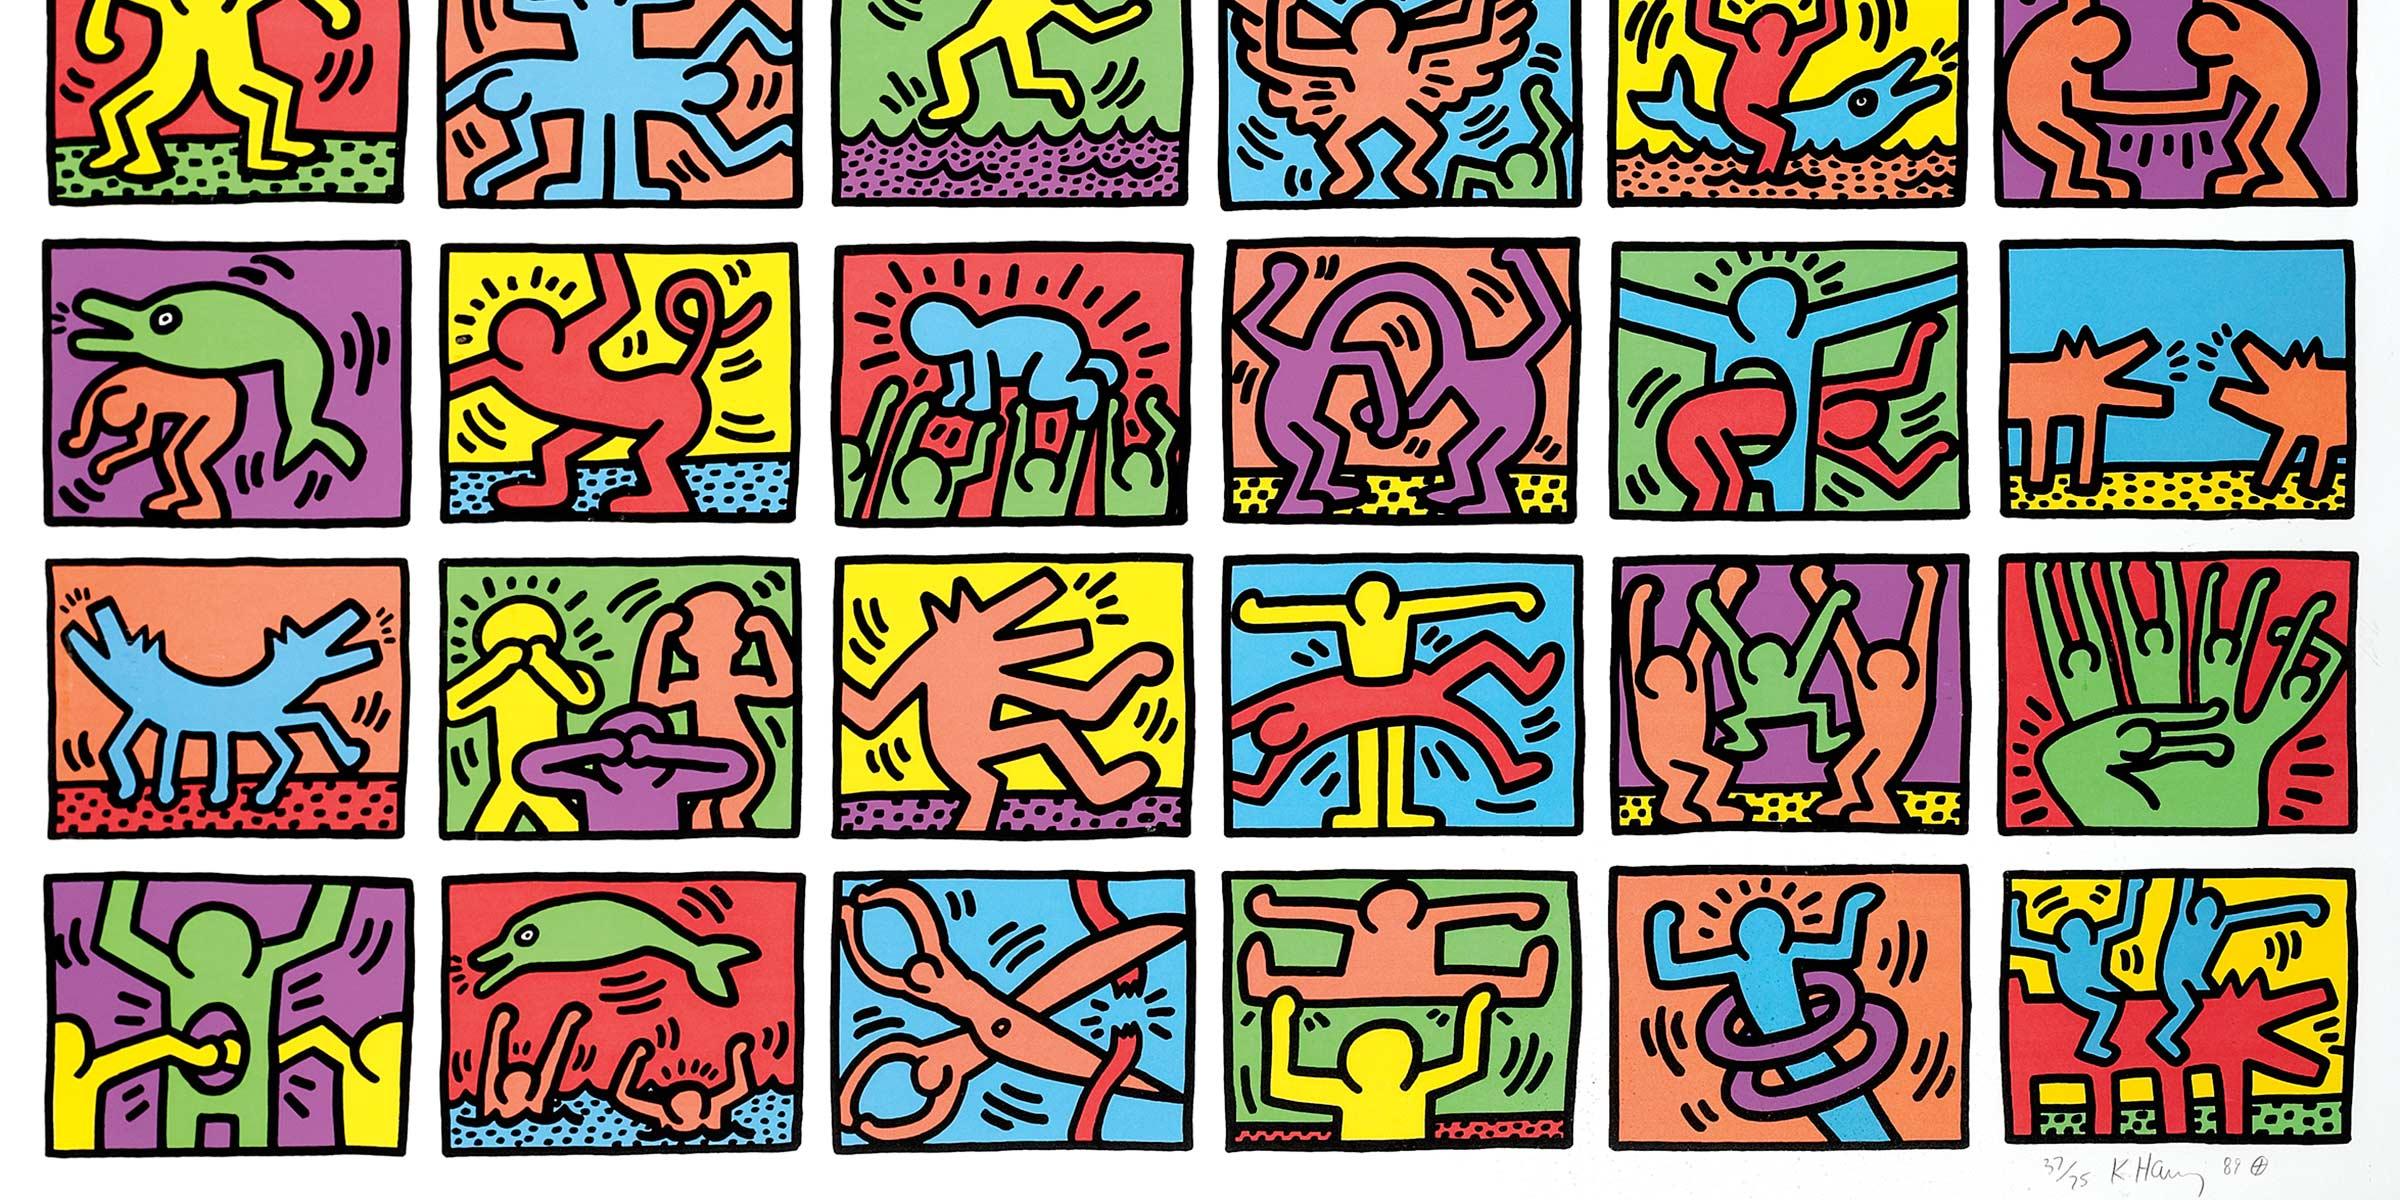 Artist Research Keith Haring Giga Edtucker